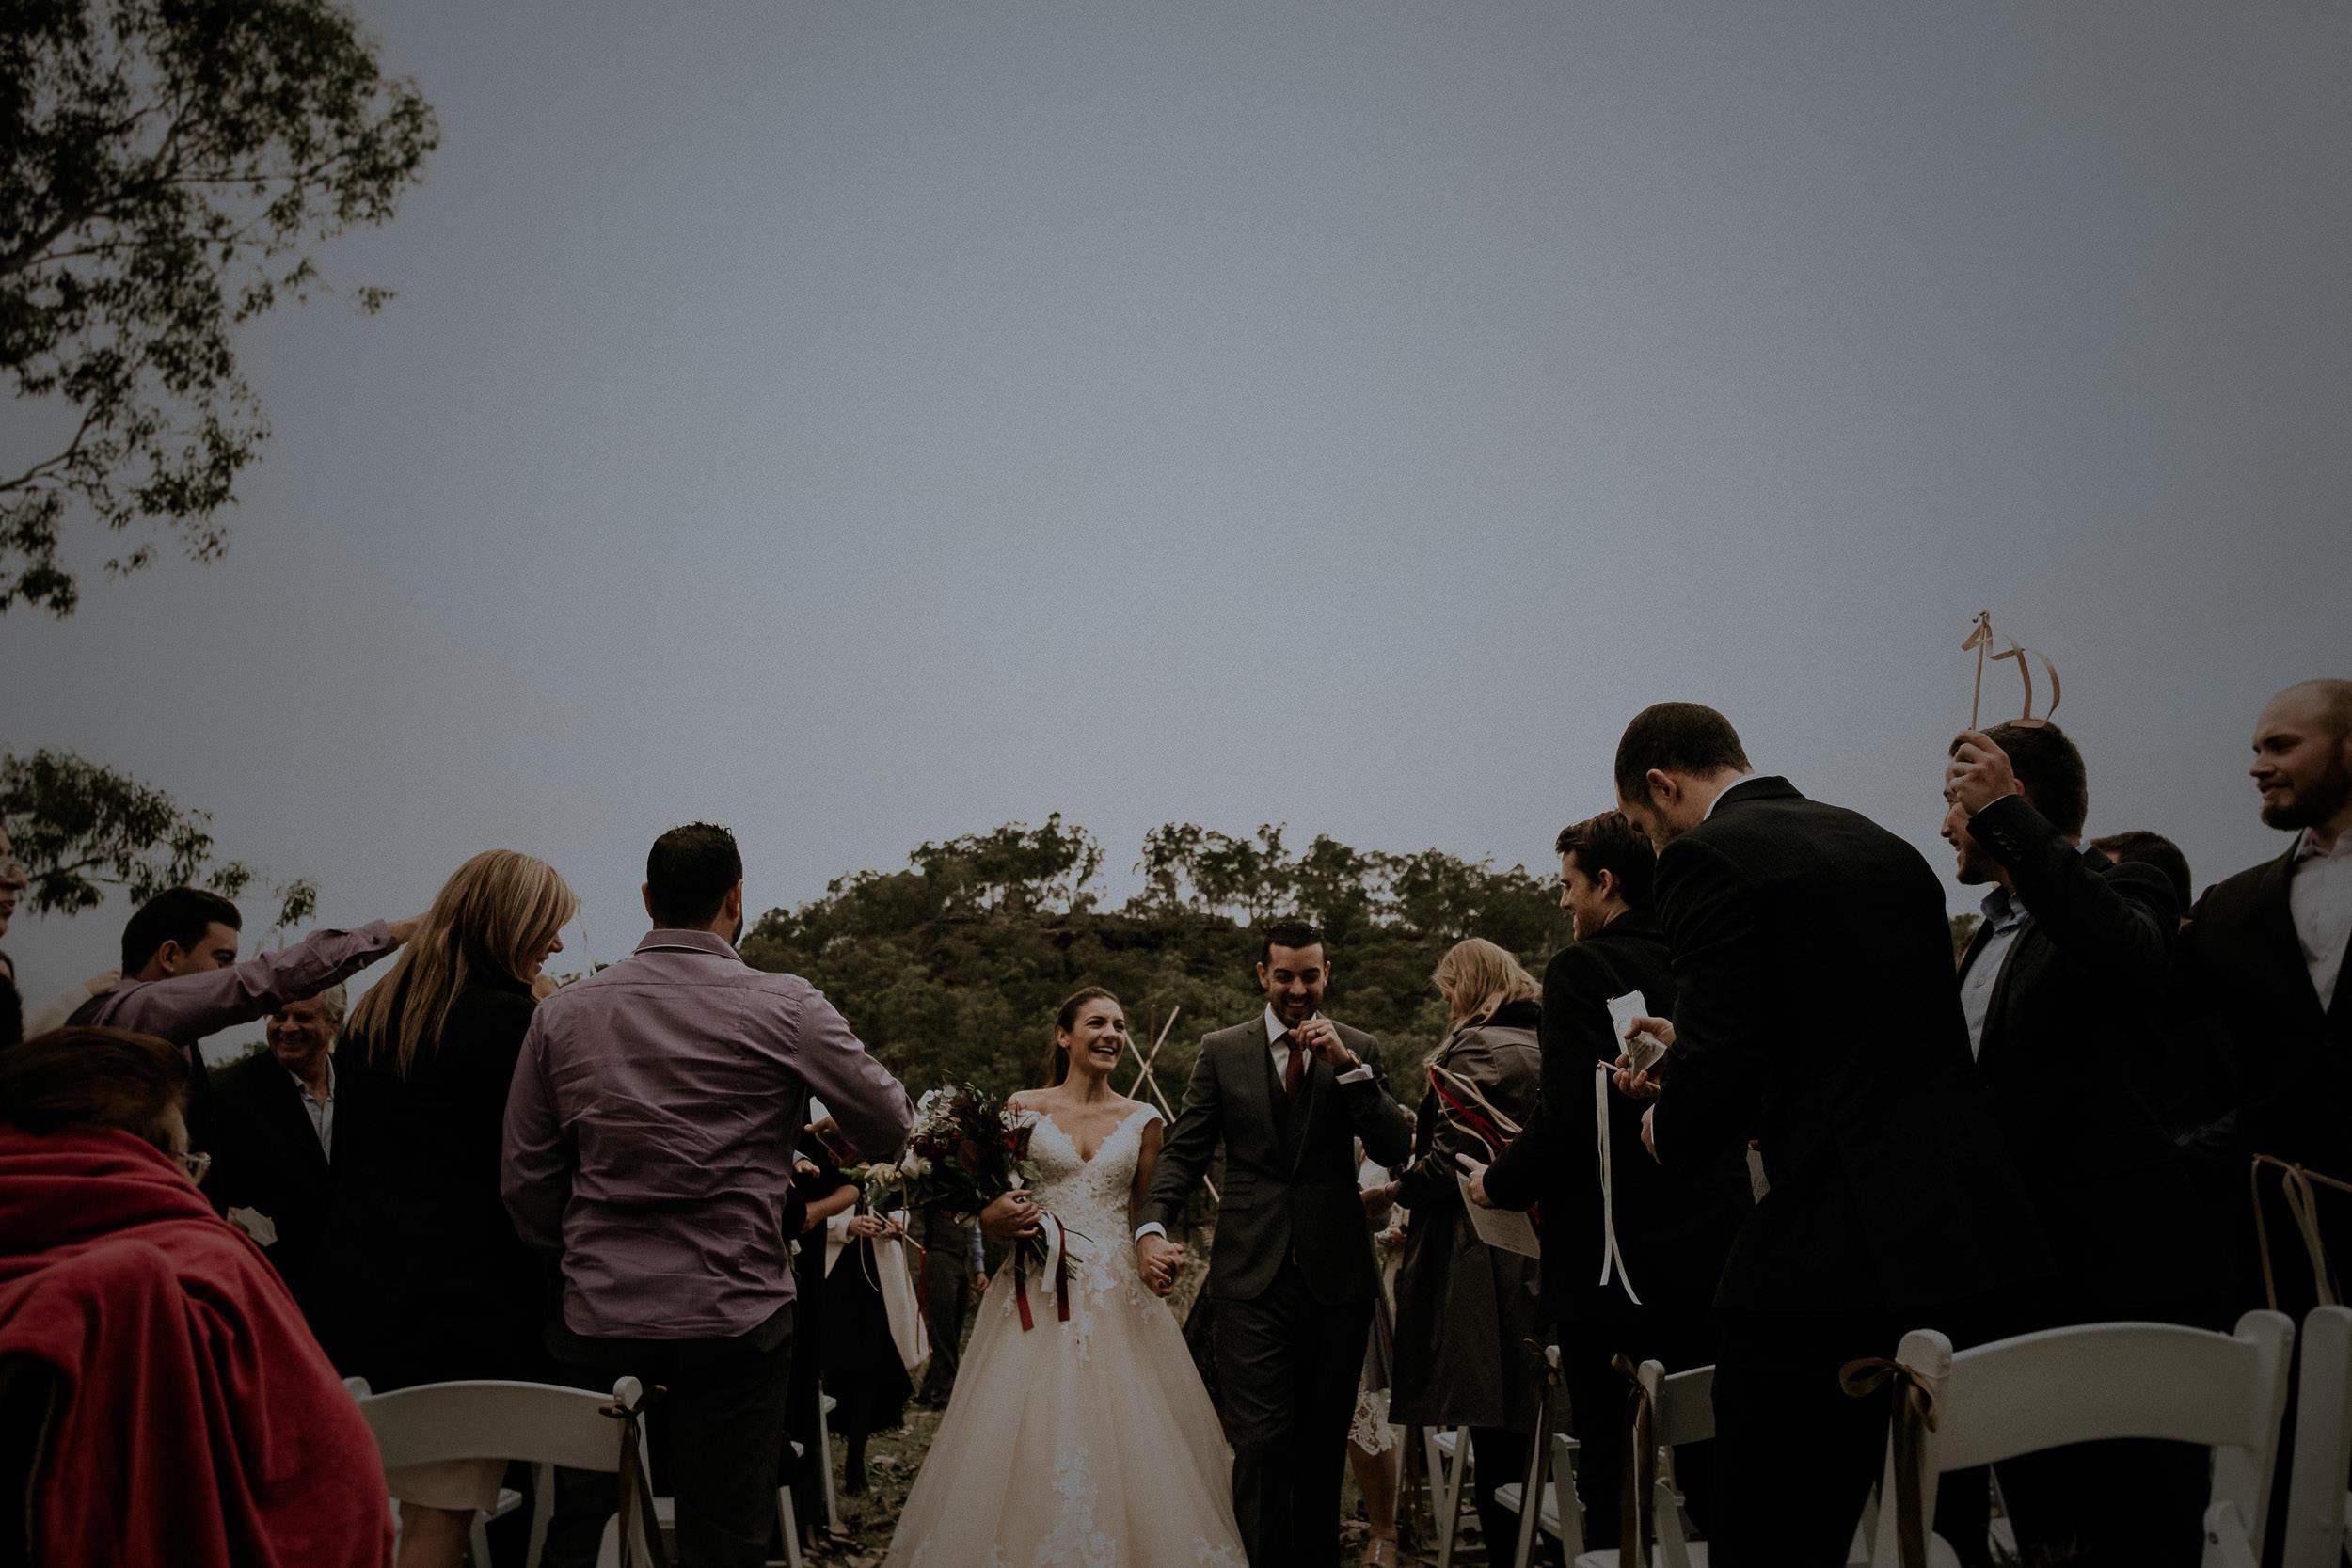 g_c wedding - kings _ thieves elopement wedding photography - blog 55.jpg